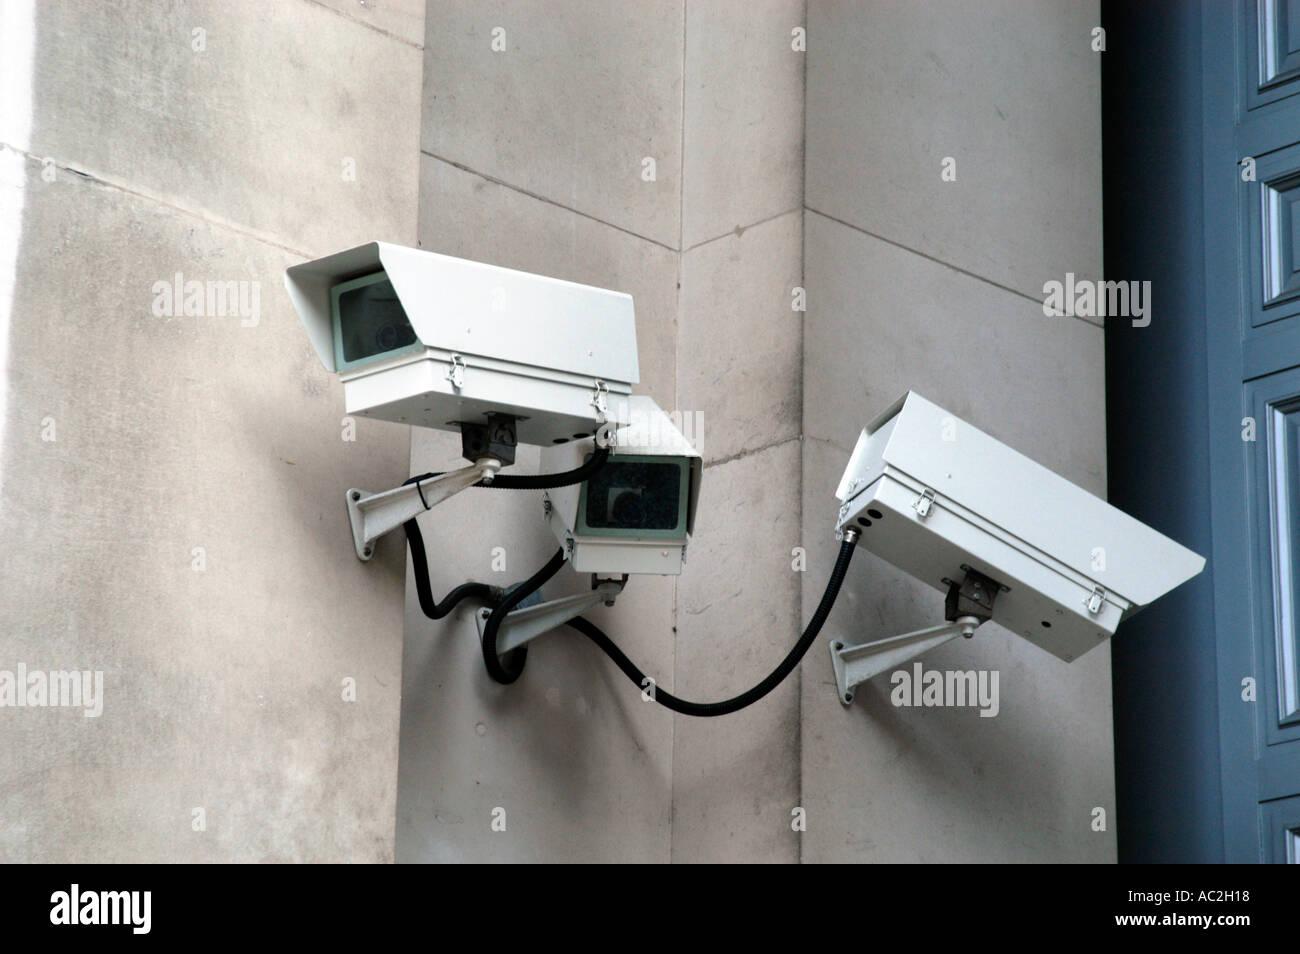 Caméras de sécurité CCTV London England UK Photo Stock